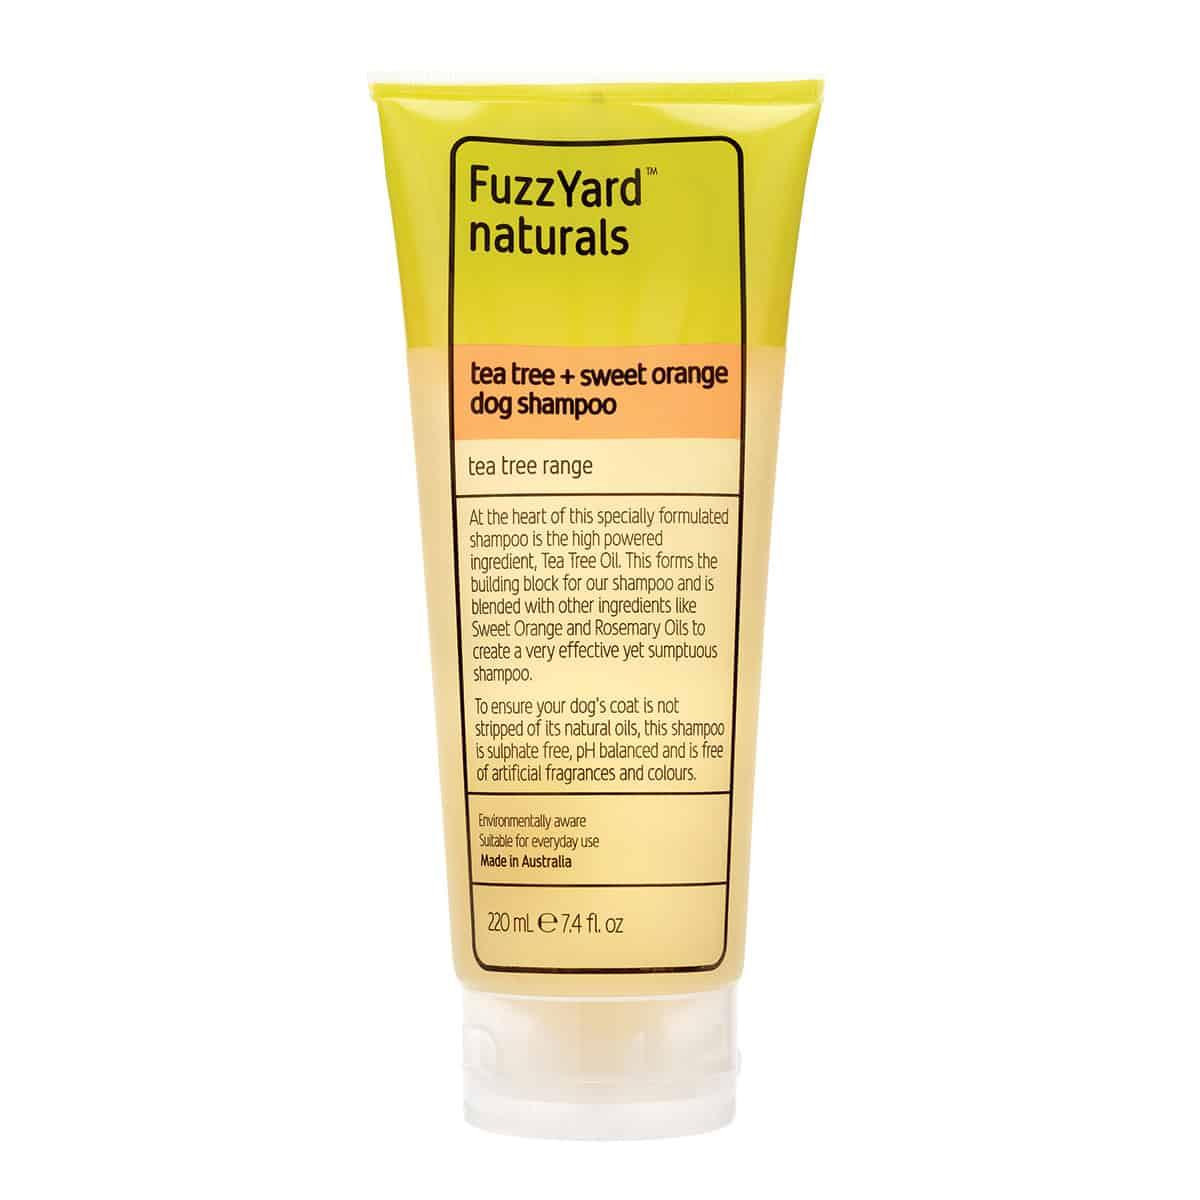 Fuzzyard Naturals - Tea Tree Range Shampoo